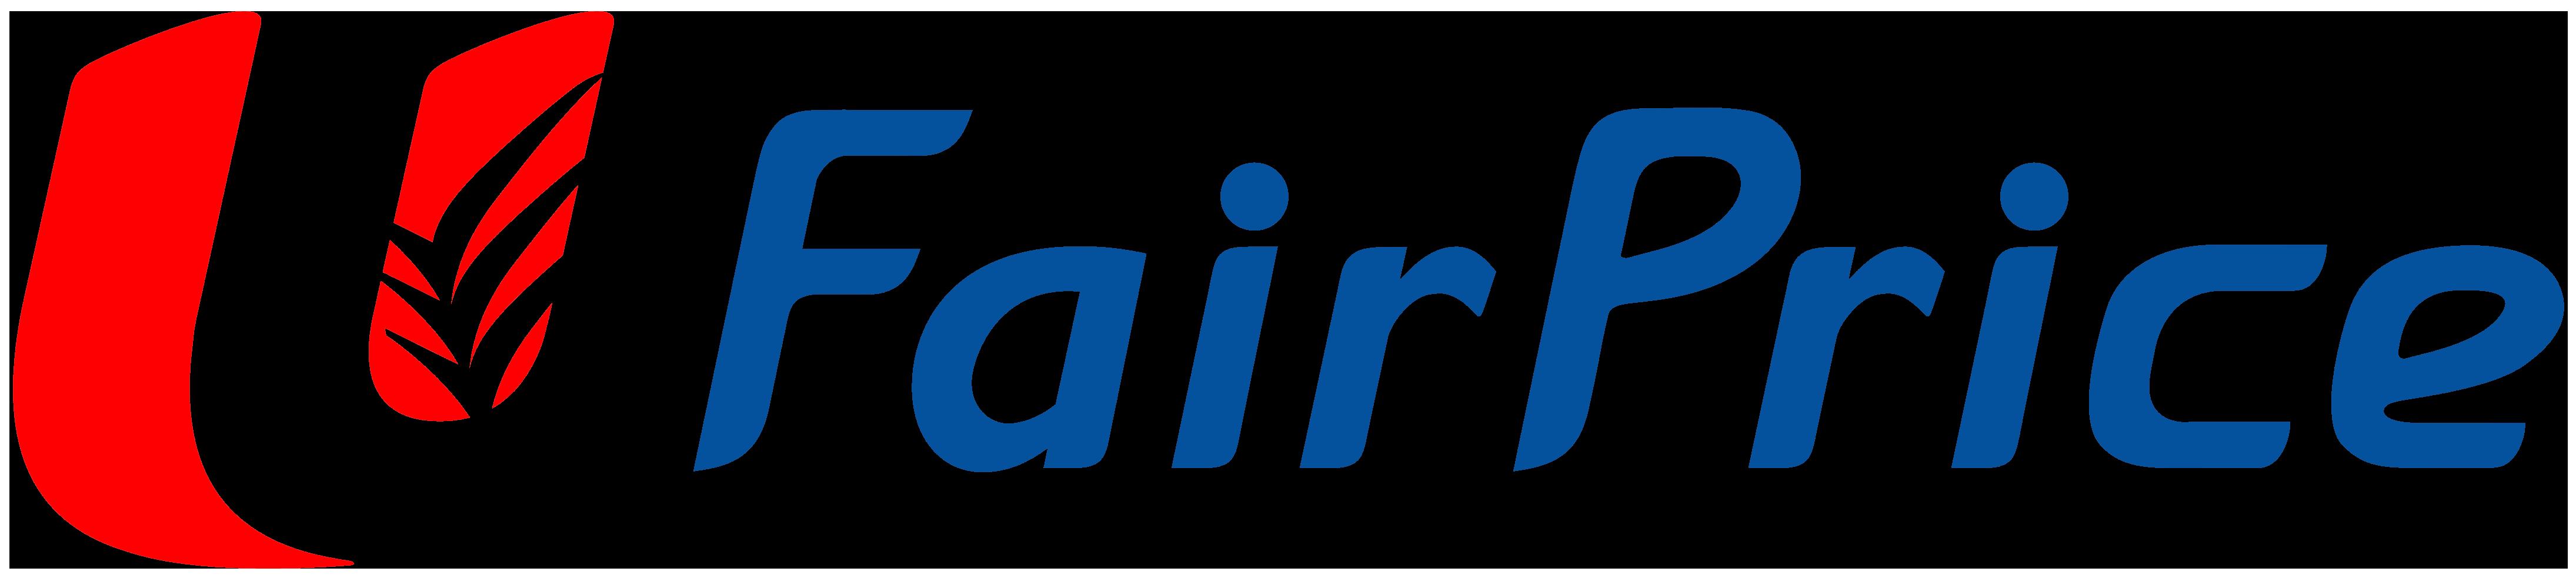 Fairprice Logo PNG